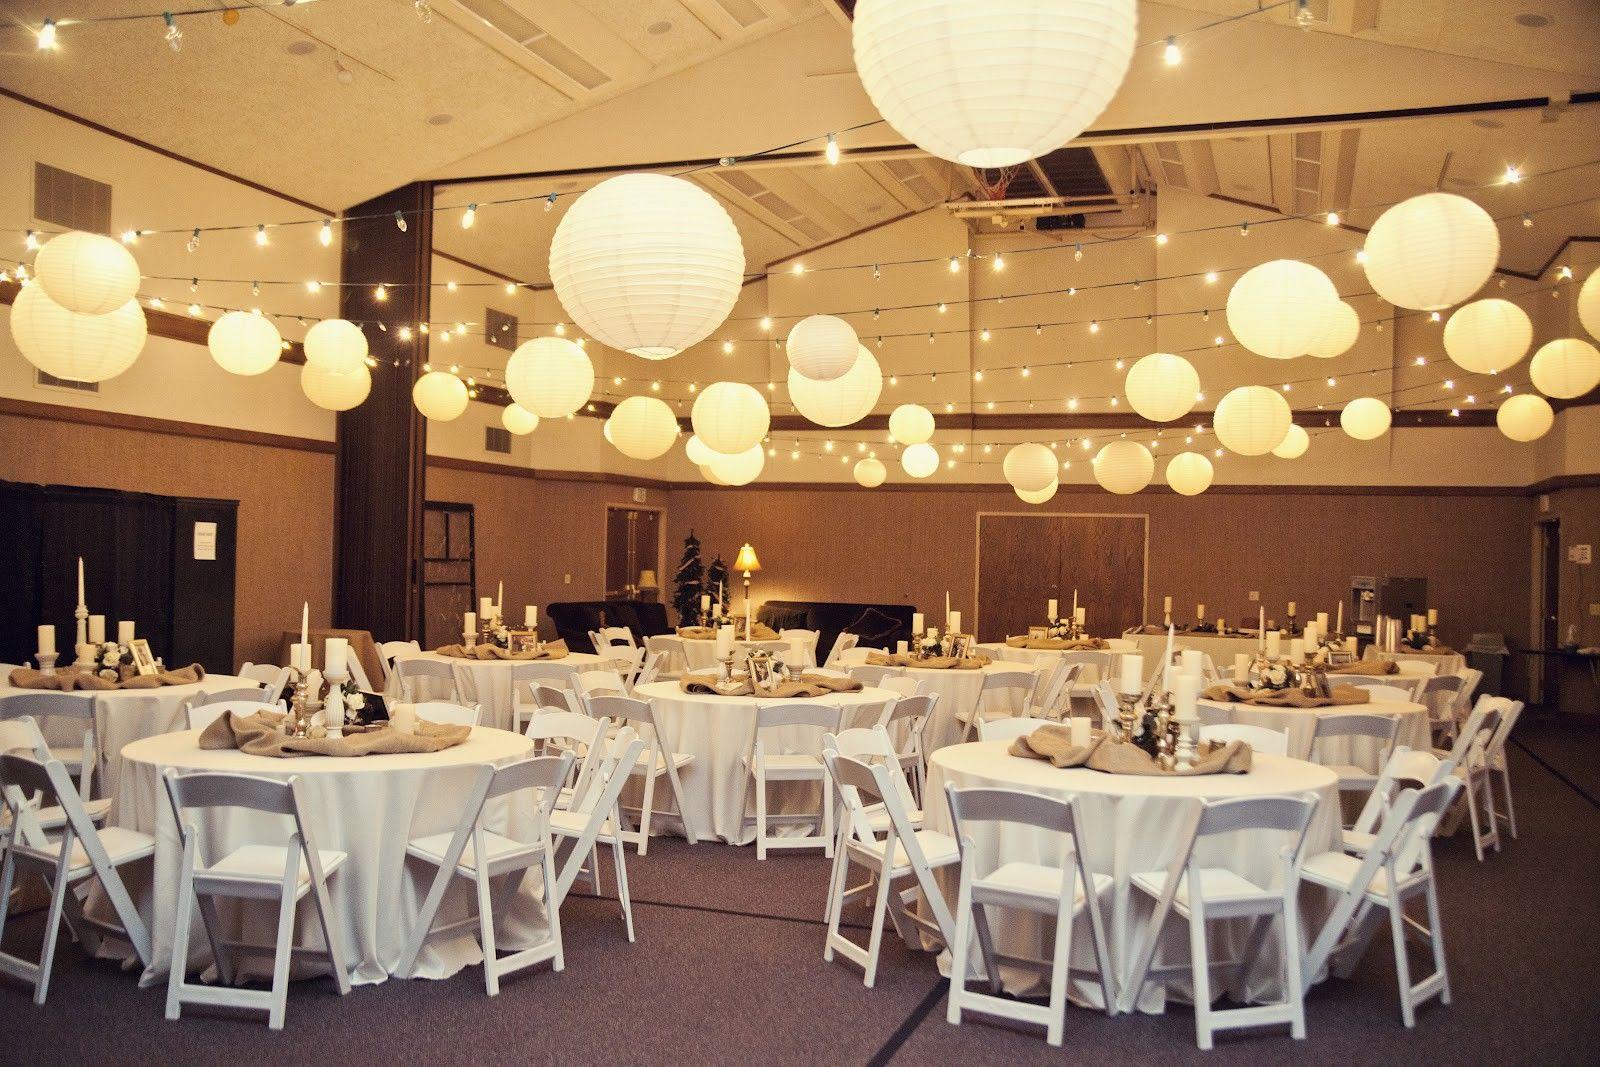 Home lighting center church wedding reception decoration ideas also rh pinterest